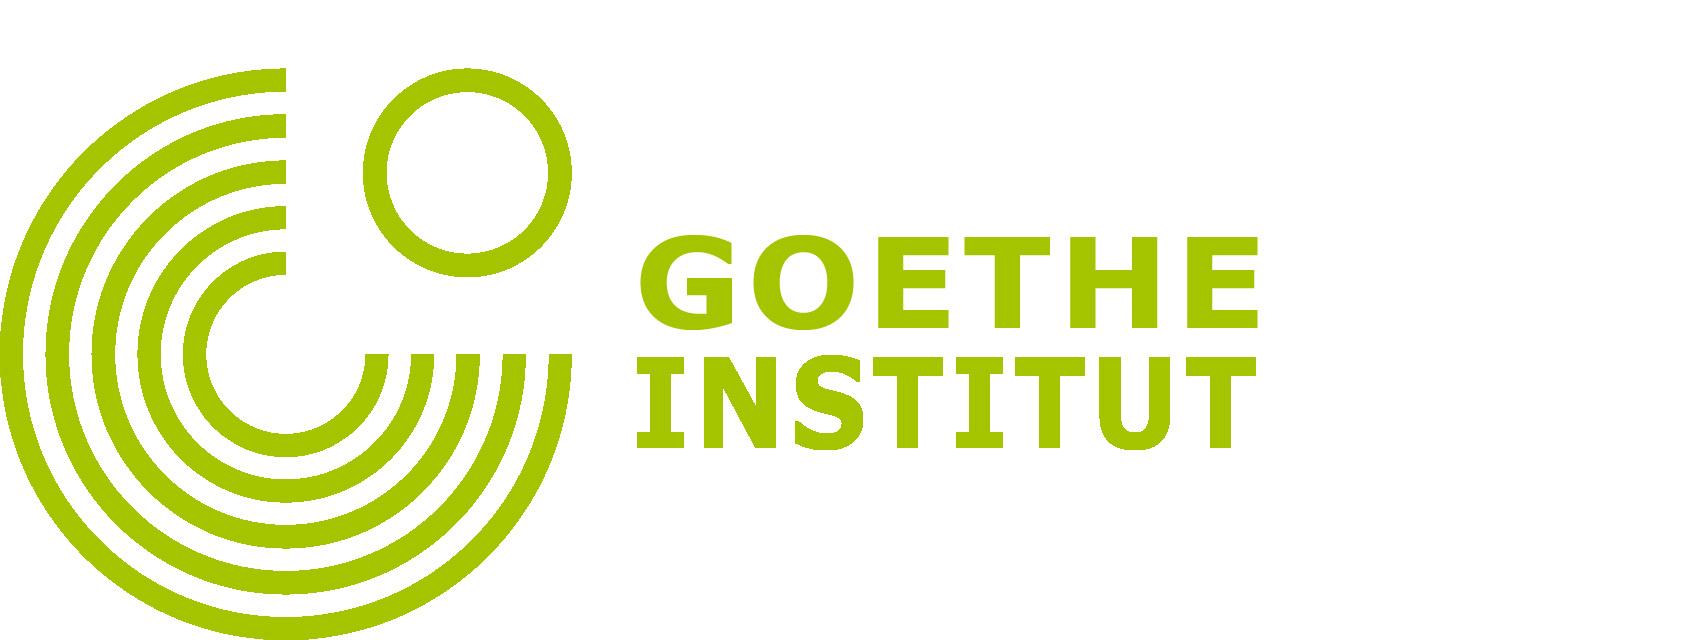 LogoGoethe.jpg